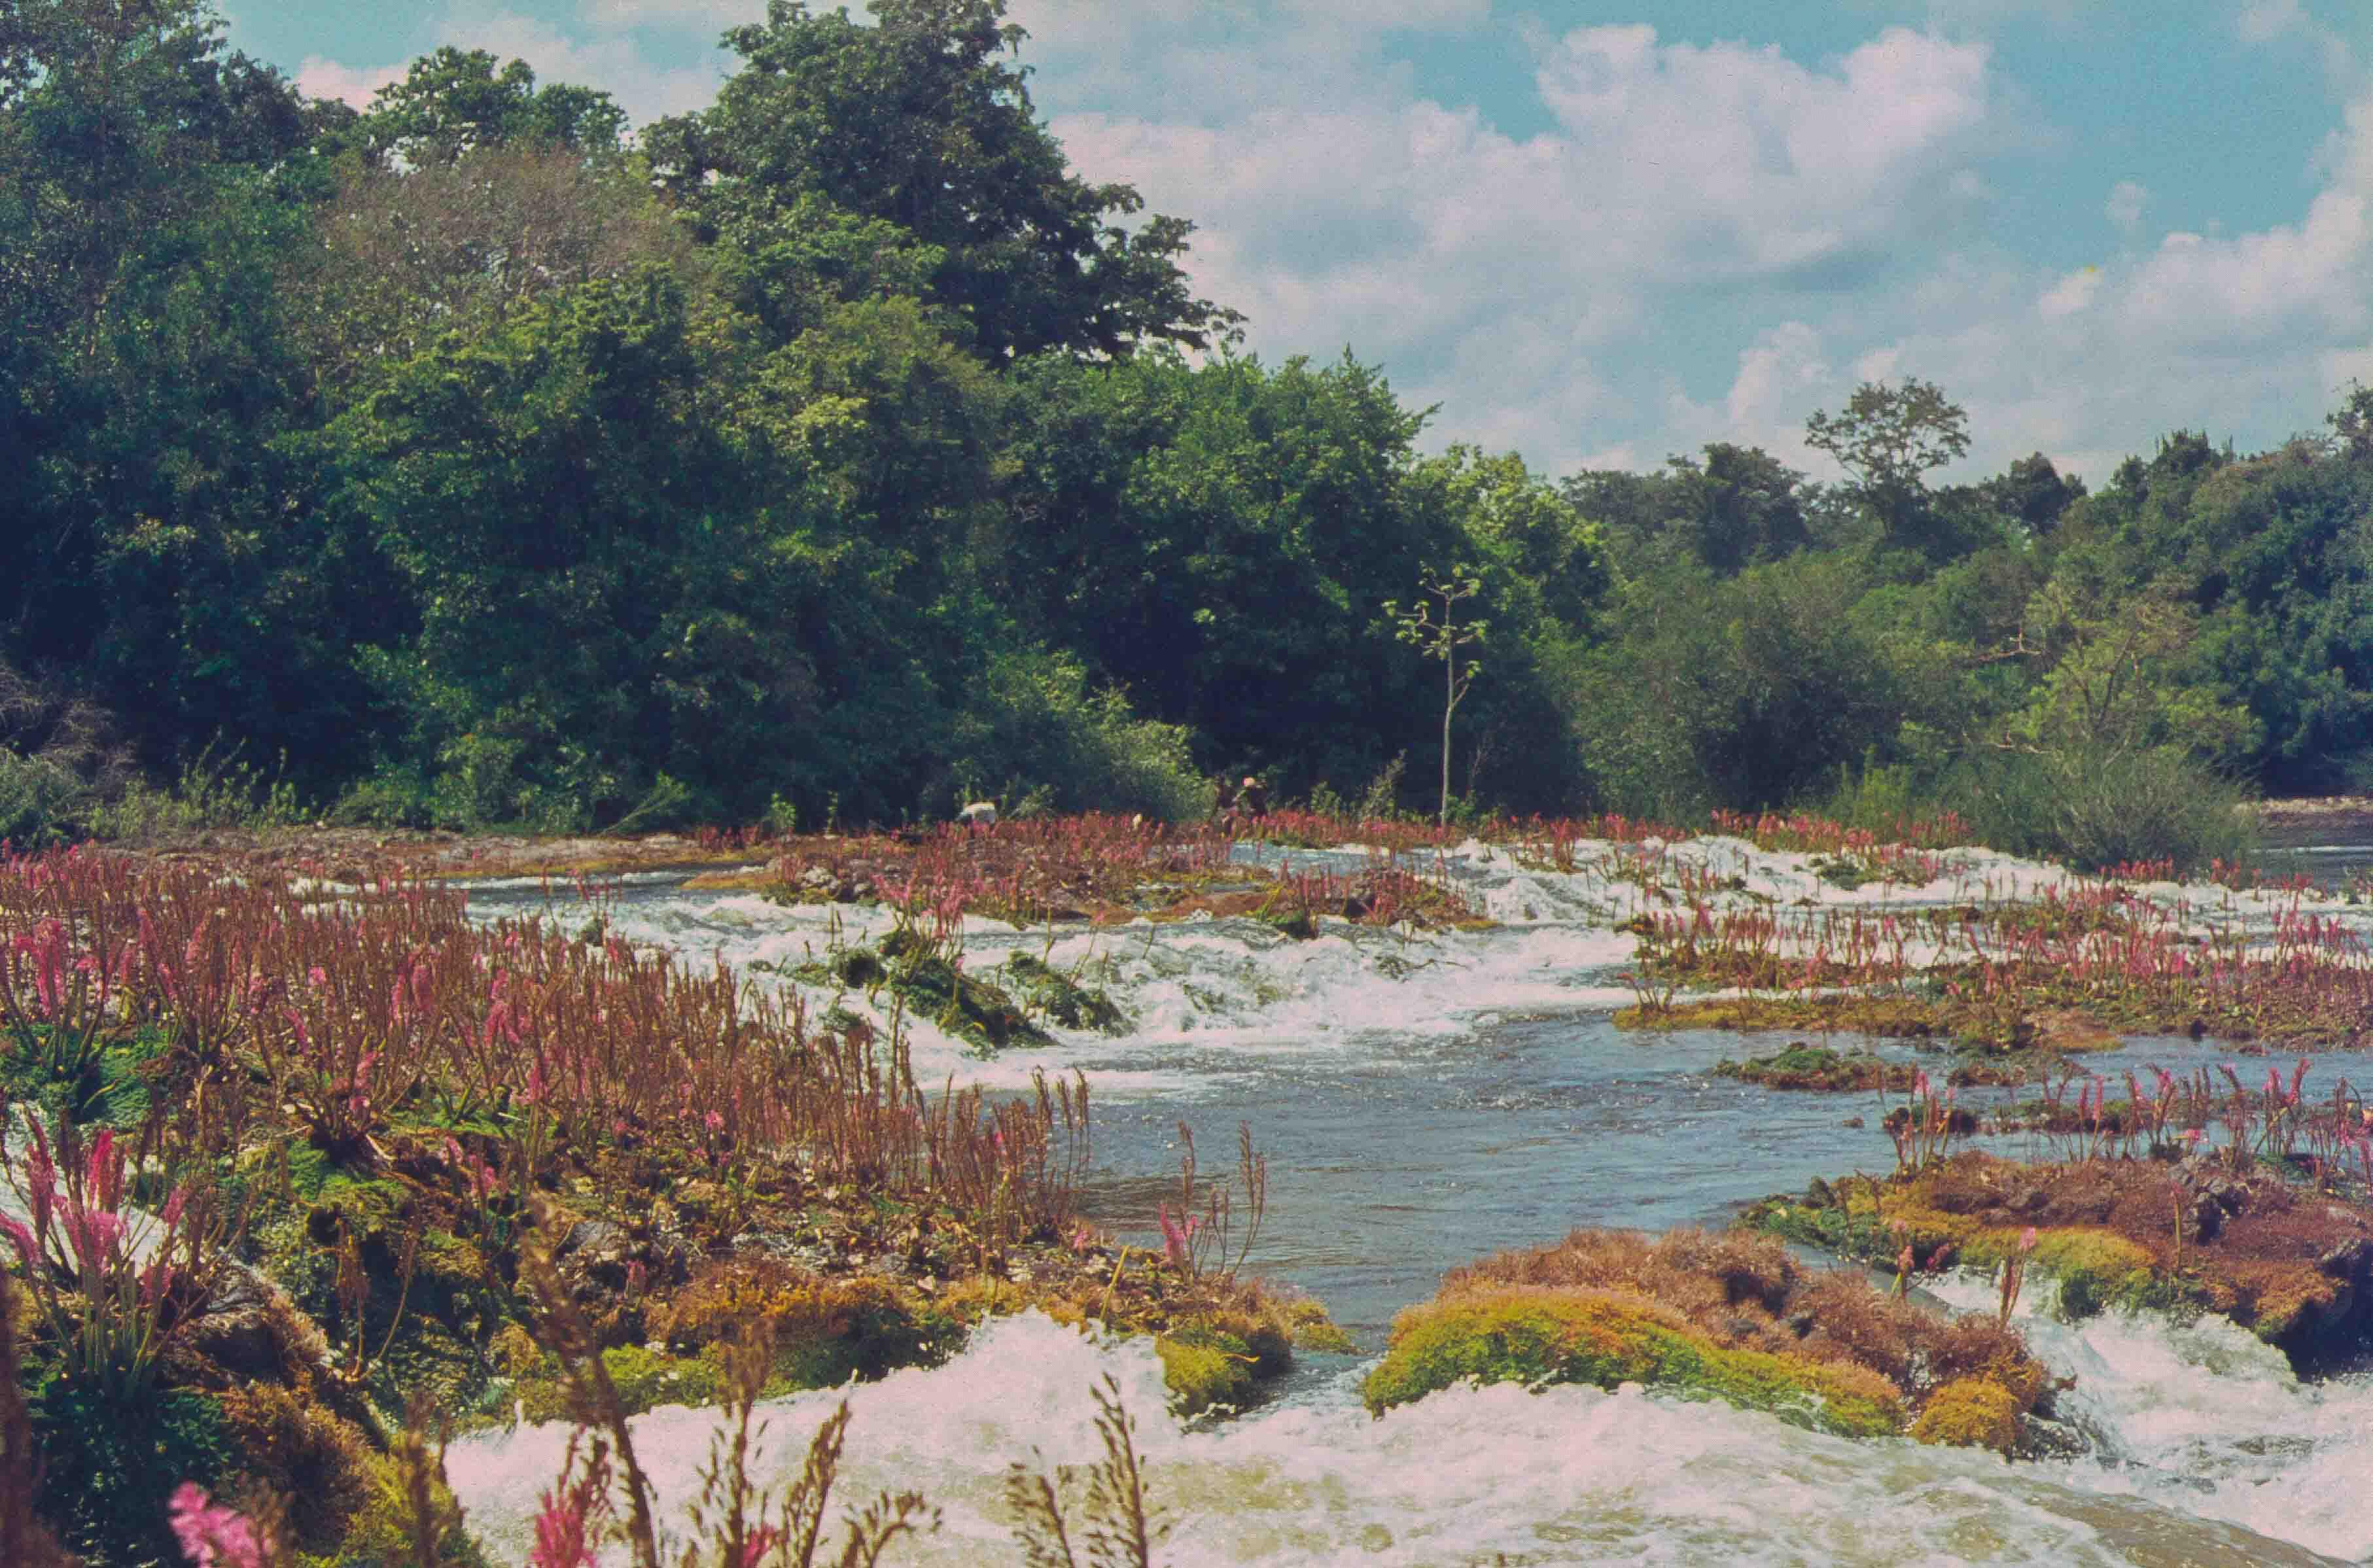 469. Suriname